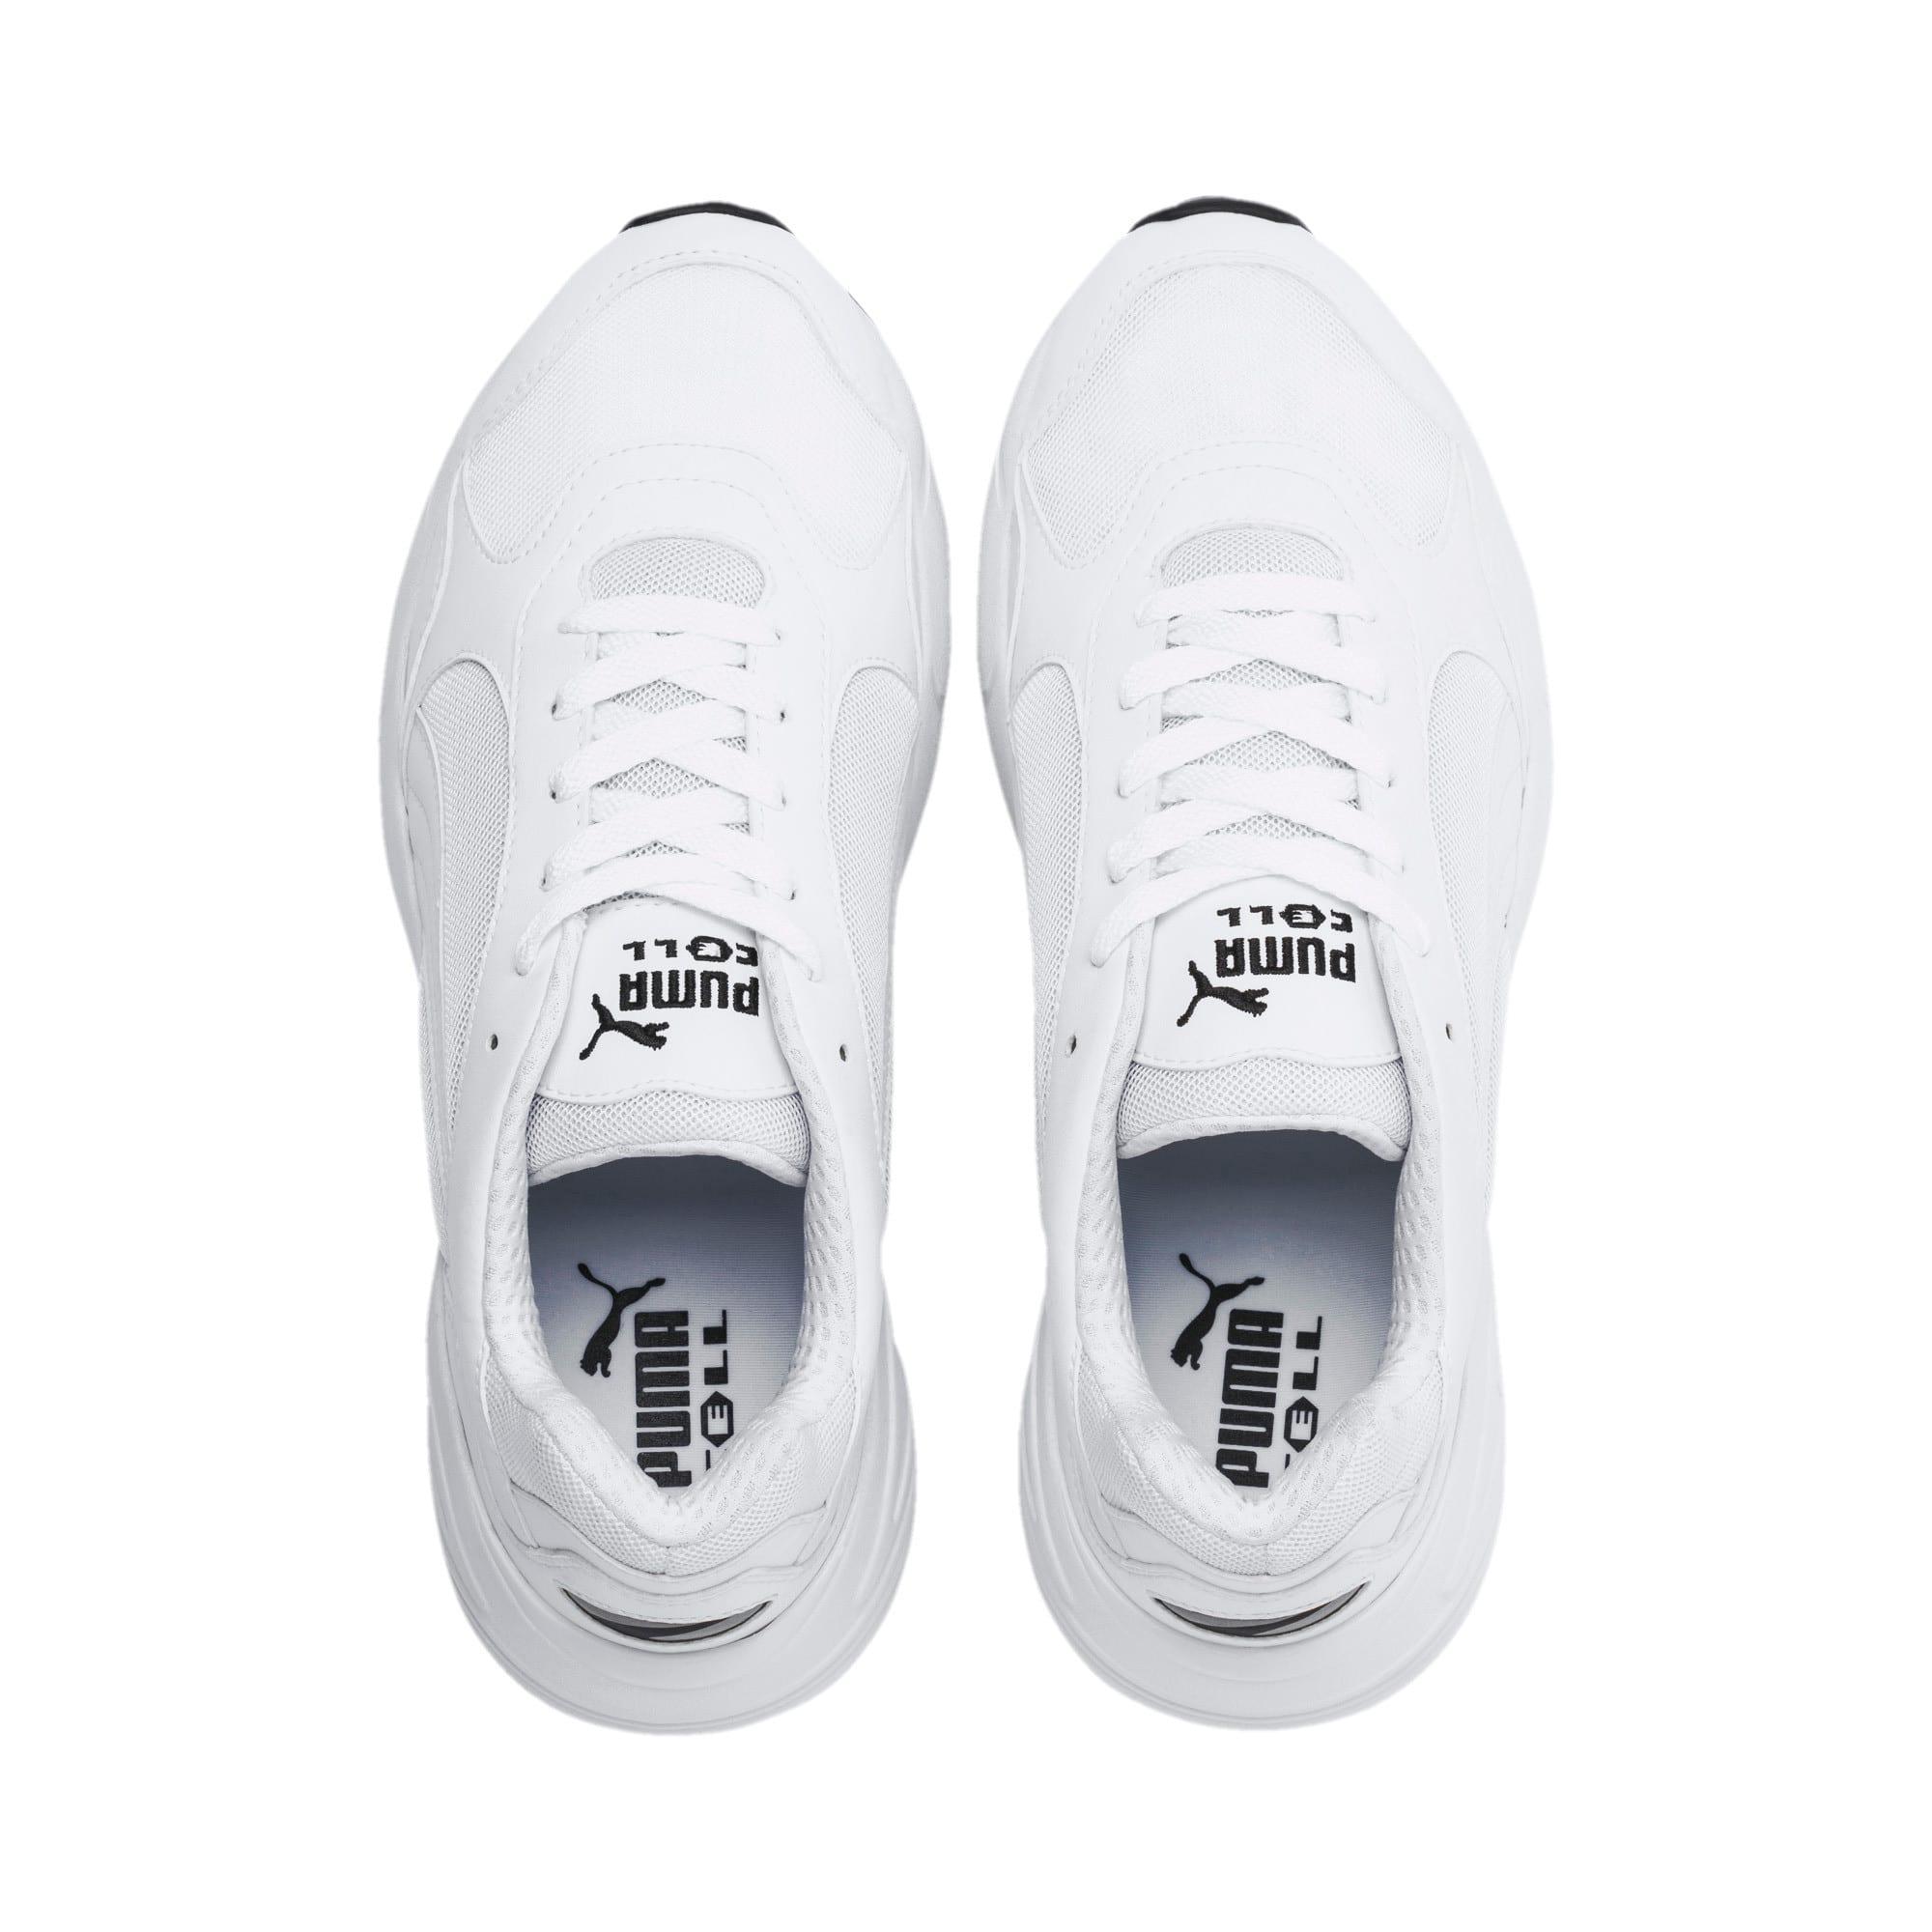 Thumbnail 6 of CELL Viper Sneakers, Puma White-Puma White, medium